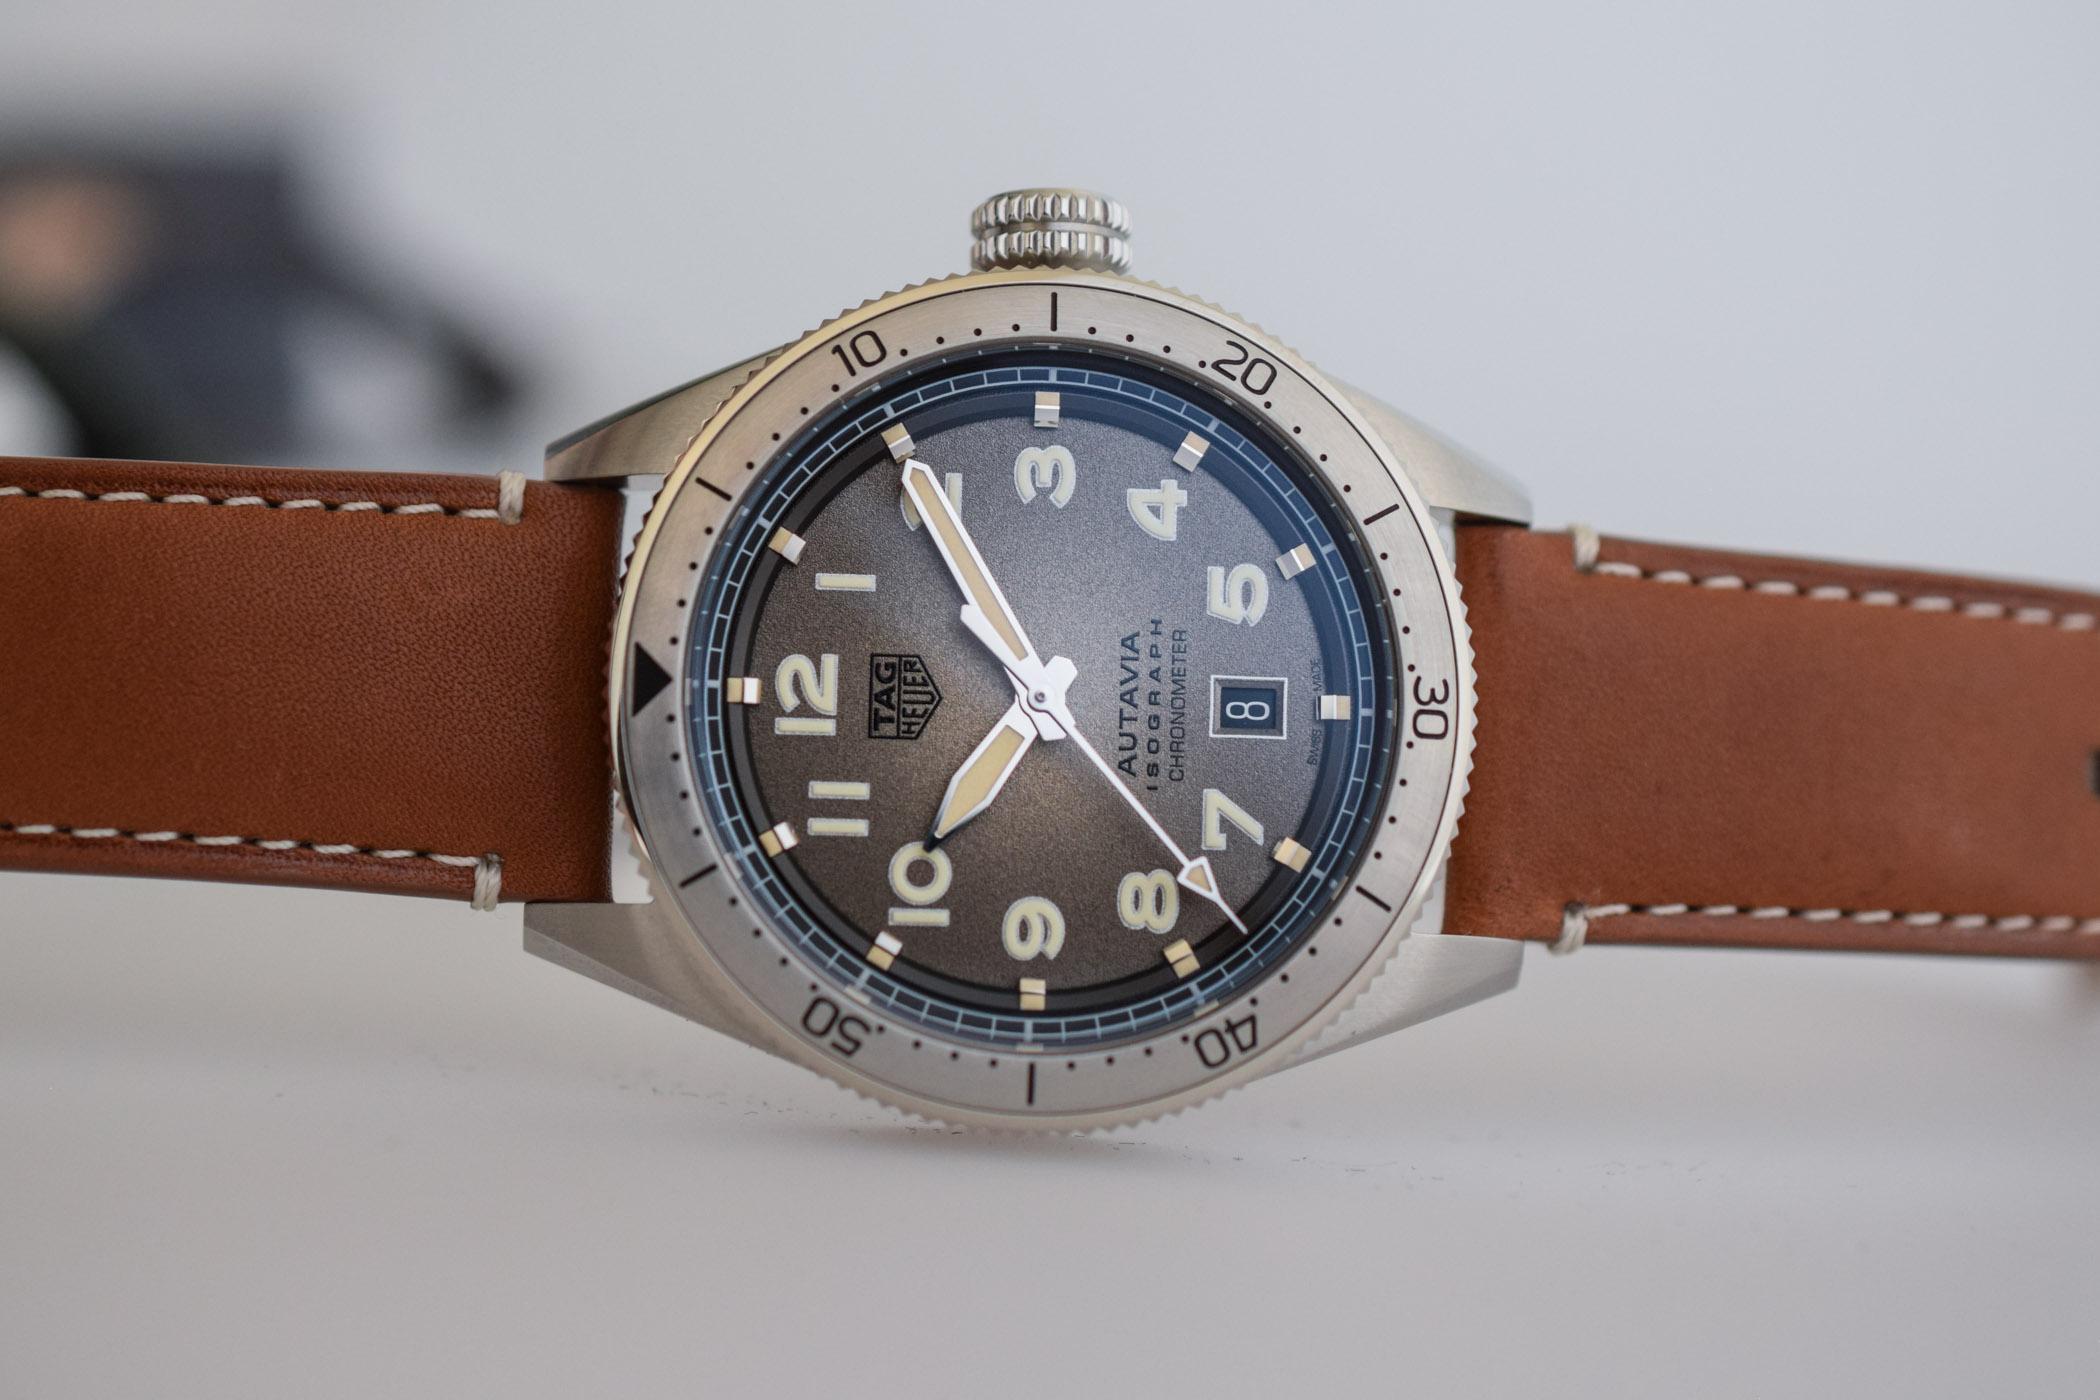 TAG Heuer Autavia Isograph Chronometer - Baselworld 2019 - 10